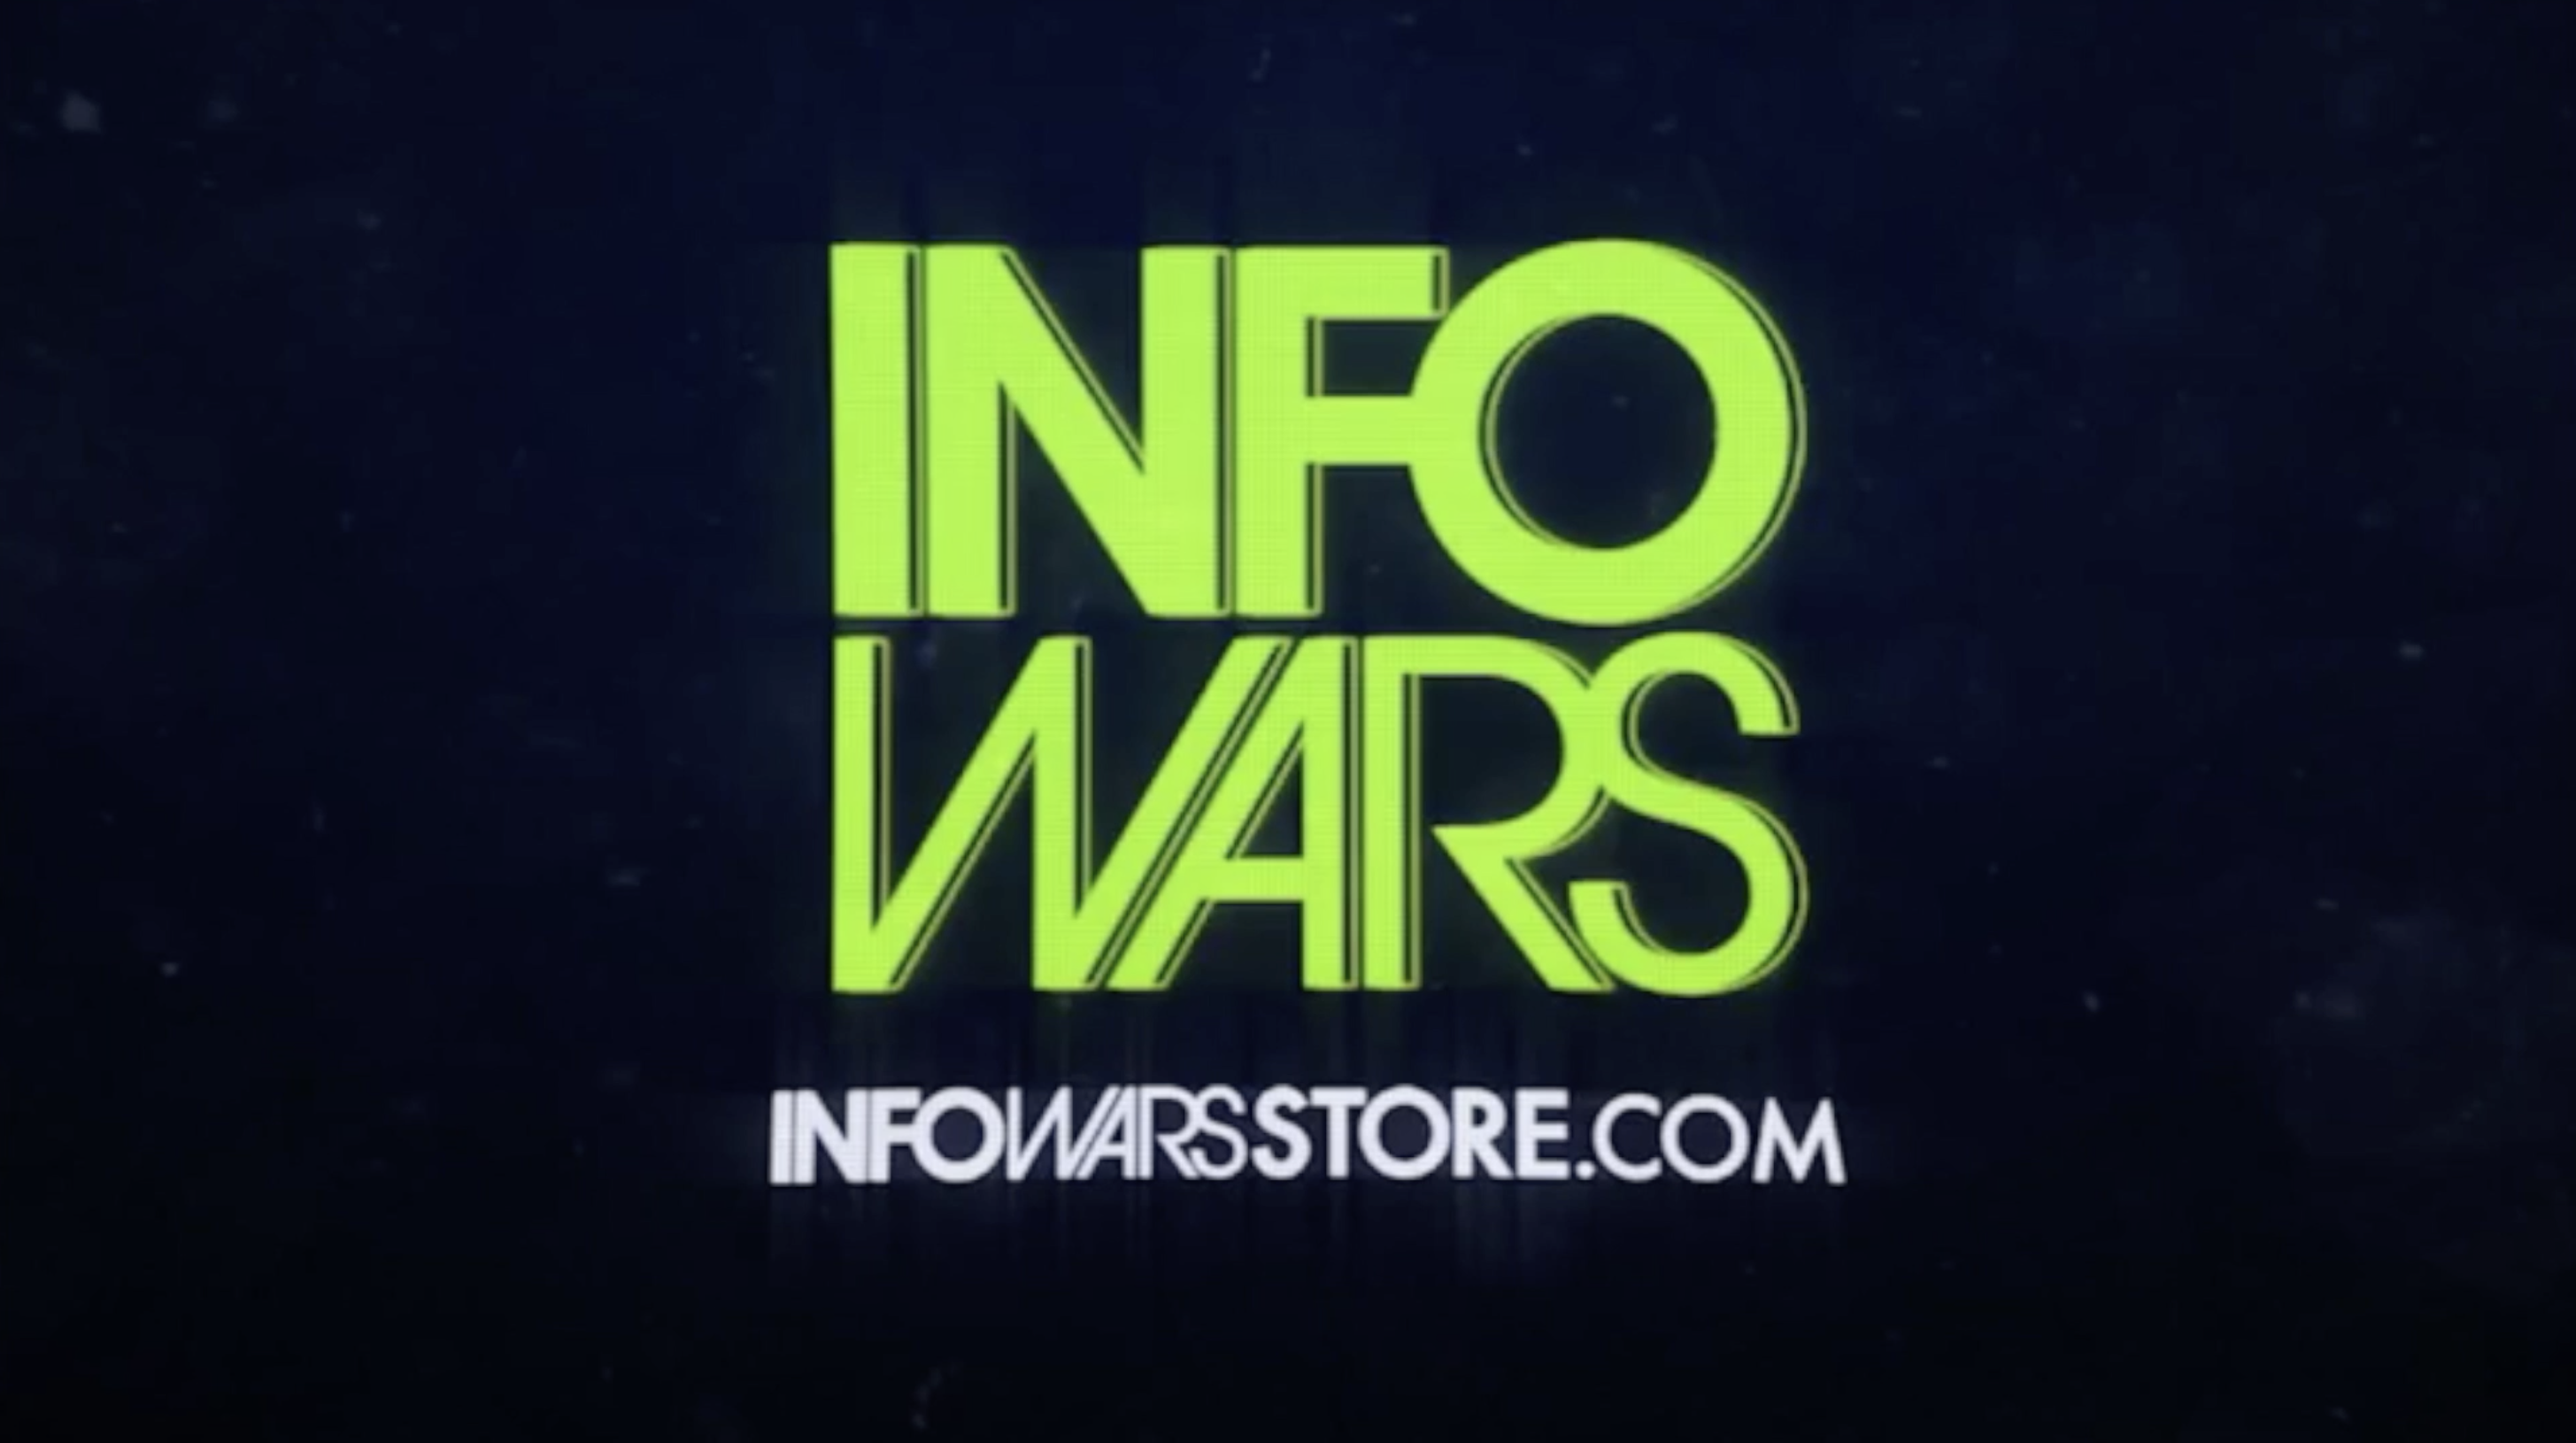 Infowars Store com 7 8 19